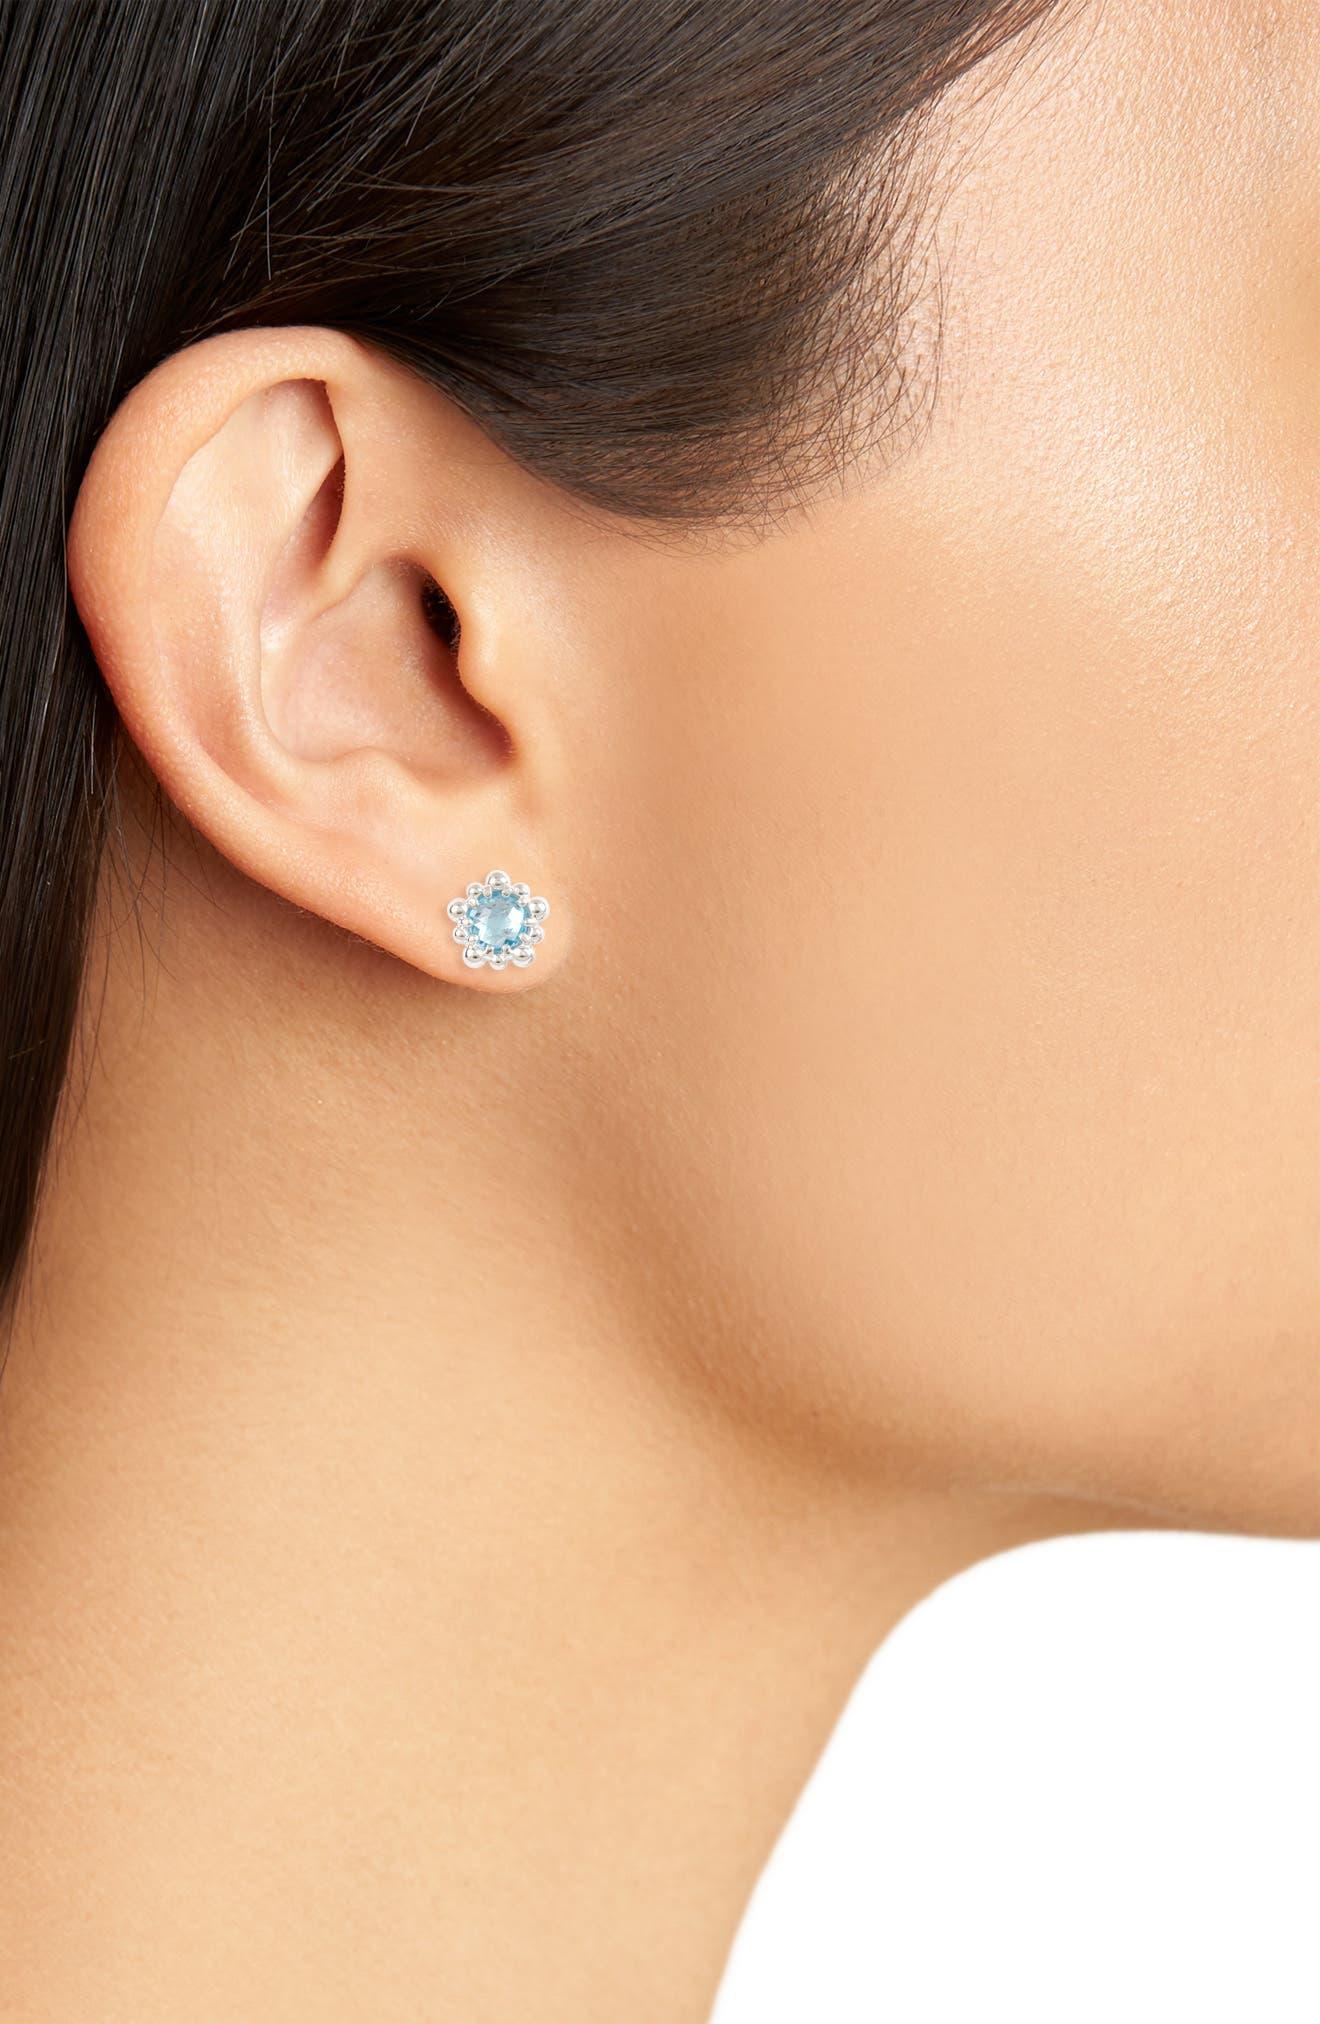 Micro Dew Drop Topaz Earrings,                             Alternate thumbnail 2, color,                             040